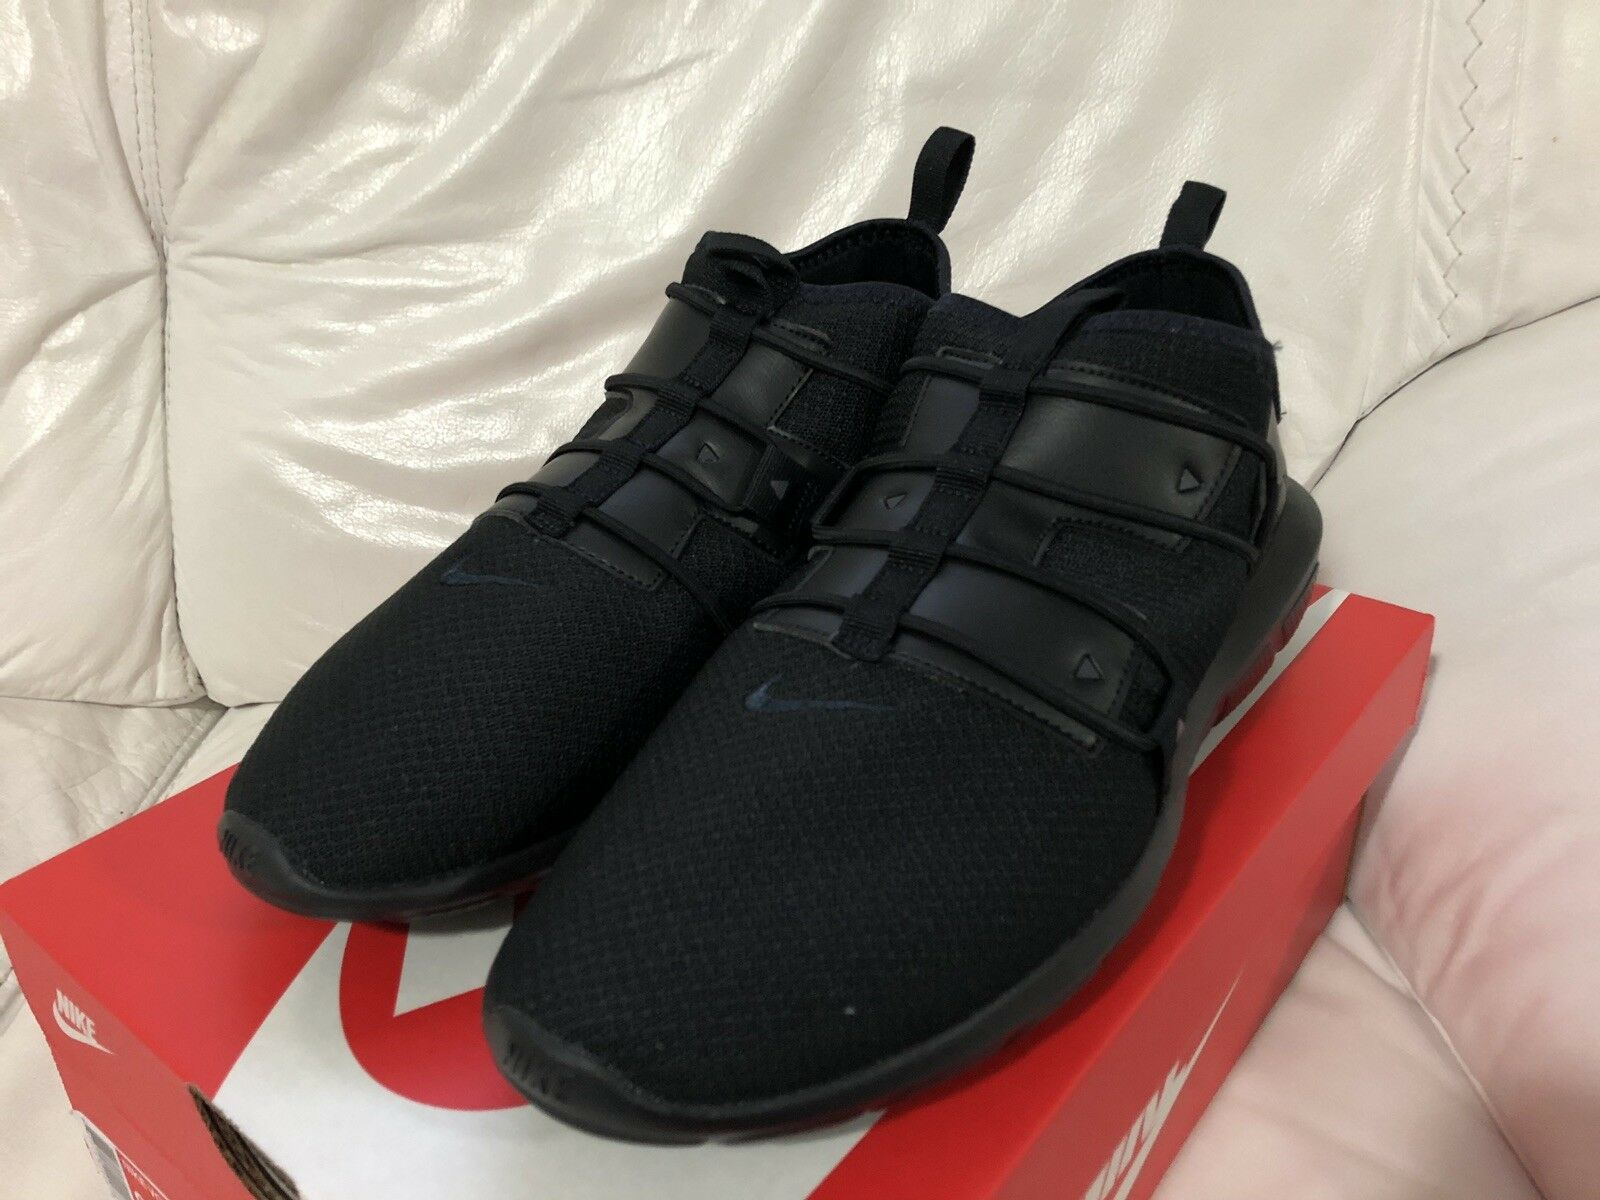 Nike Vortak Black Anthracite Men's Size 9.5 New